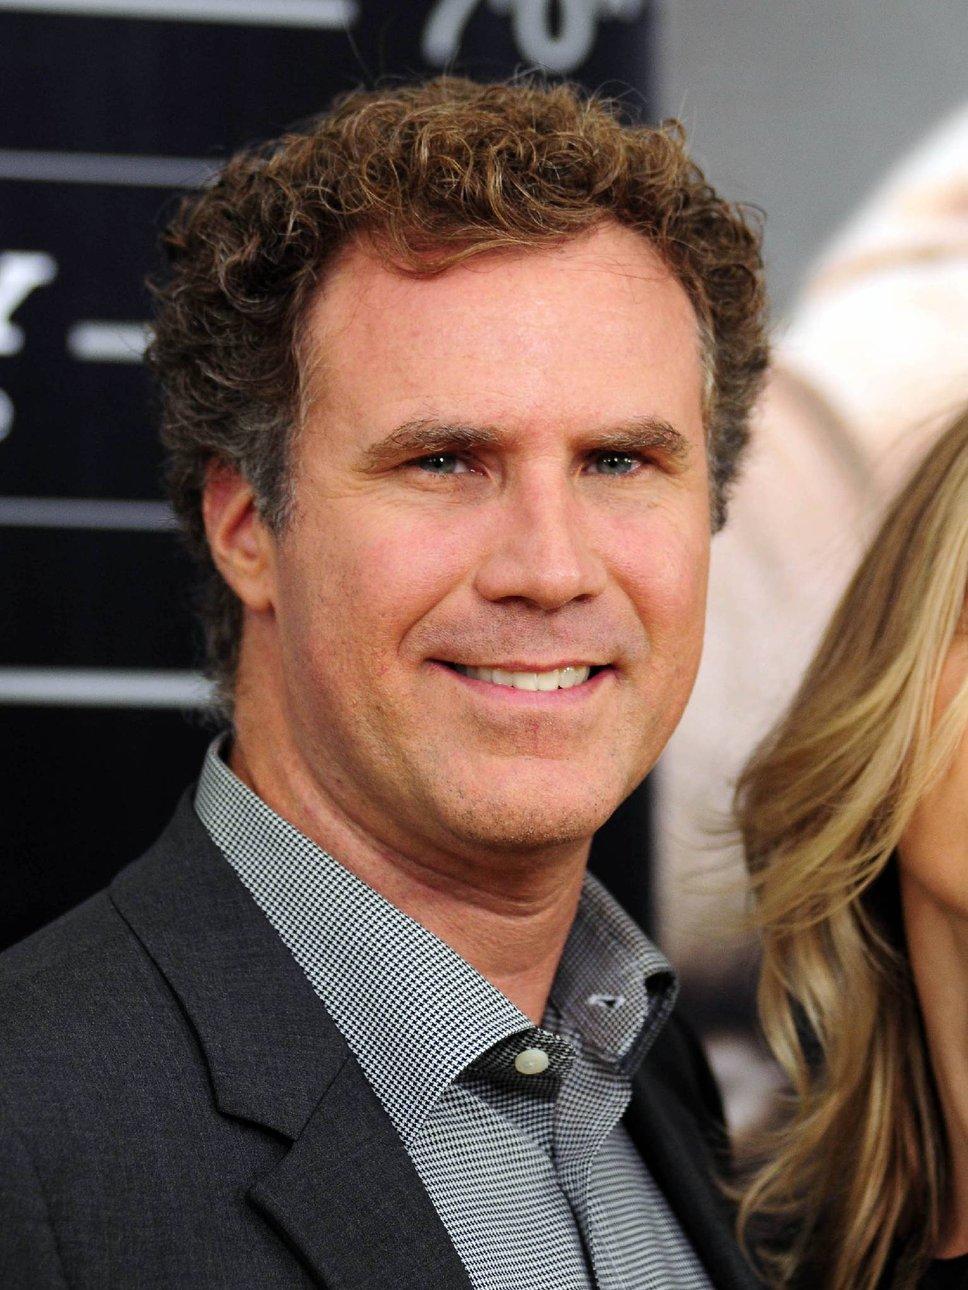 Untitled (Film) Criticism: Happy Birthday Will Ferrell!